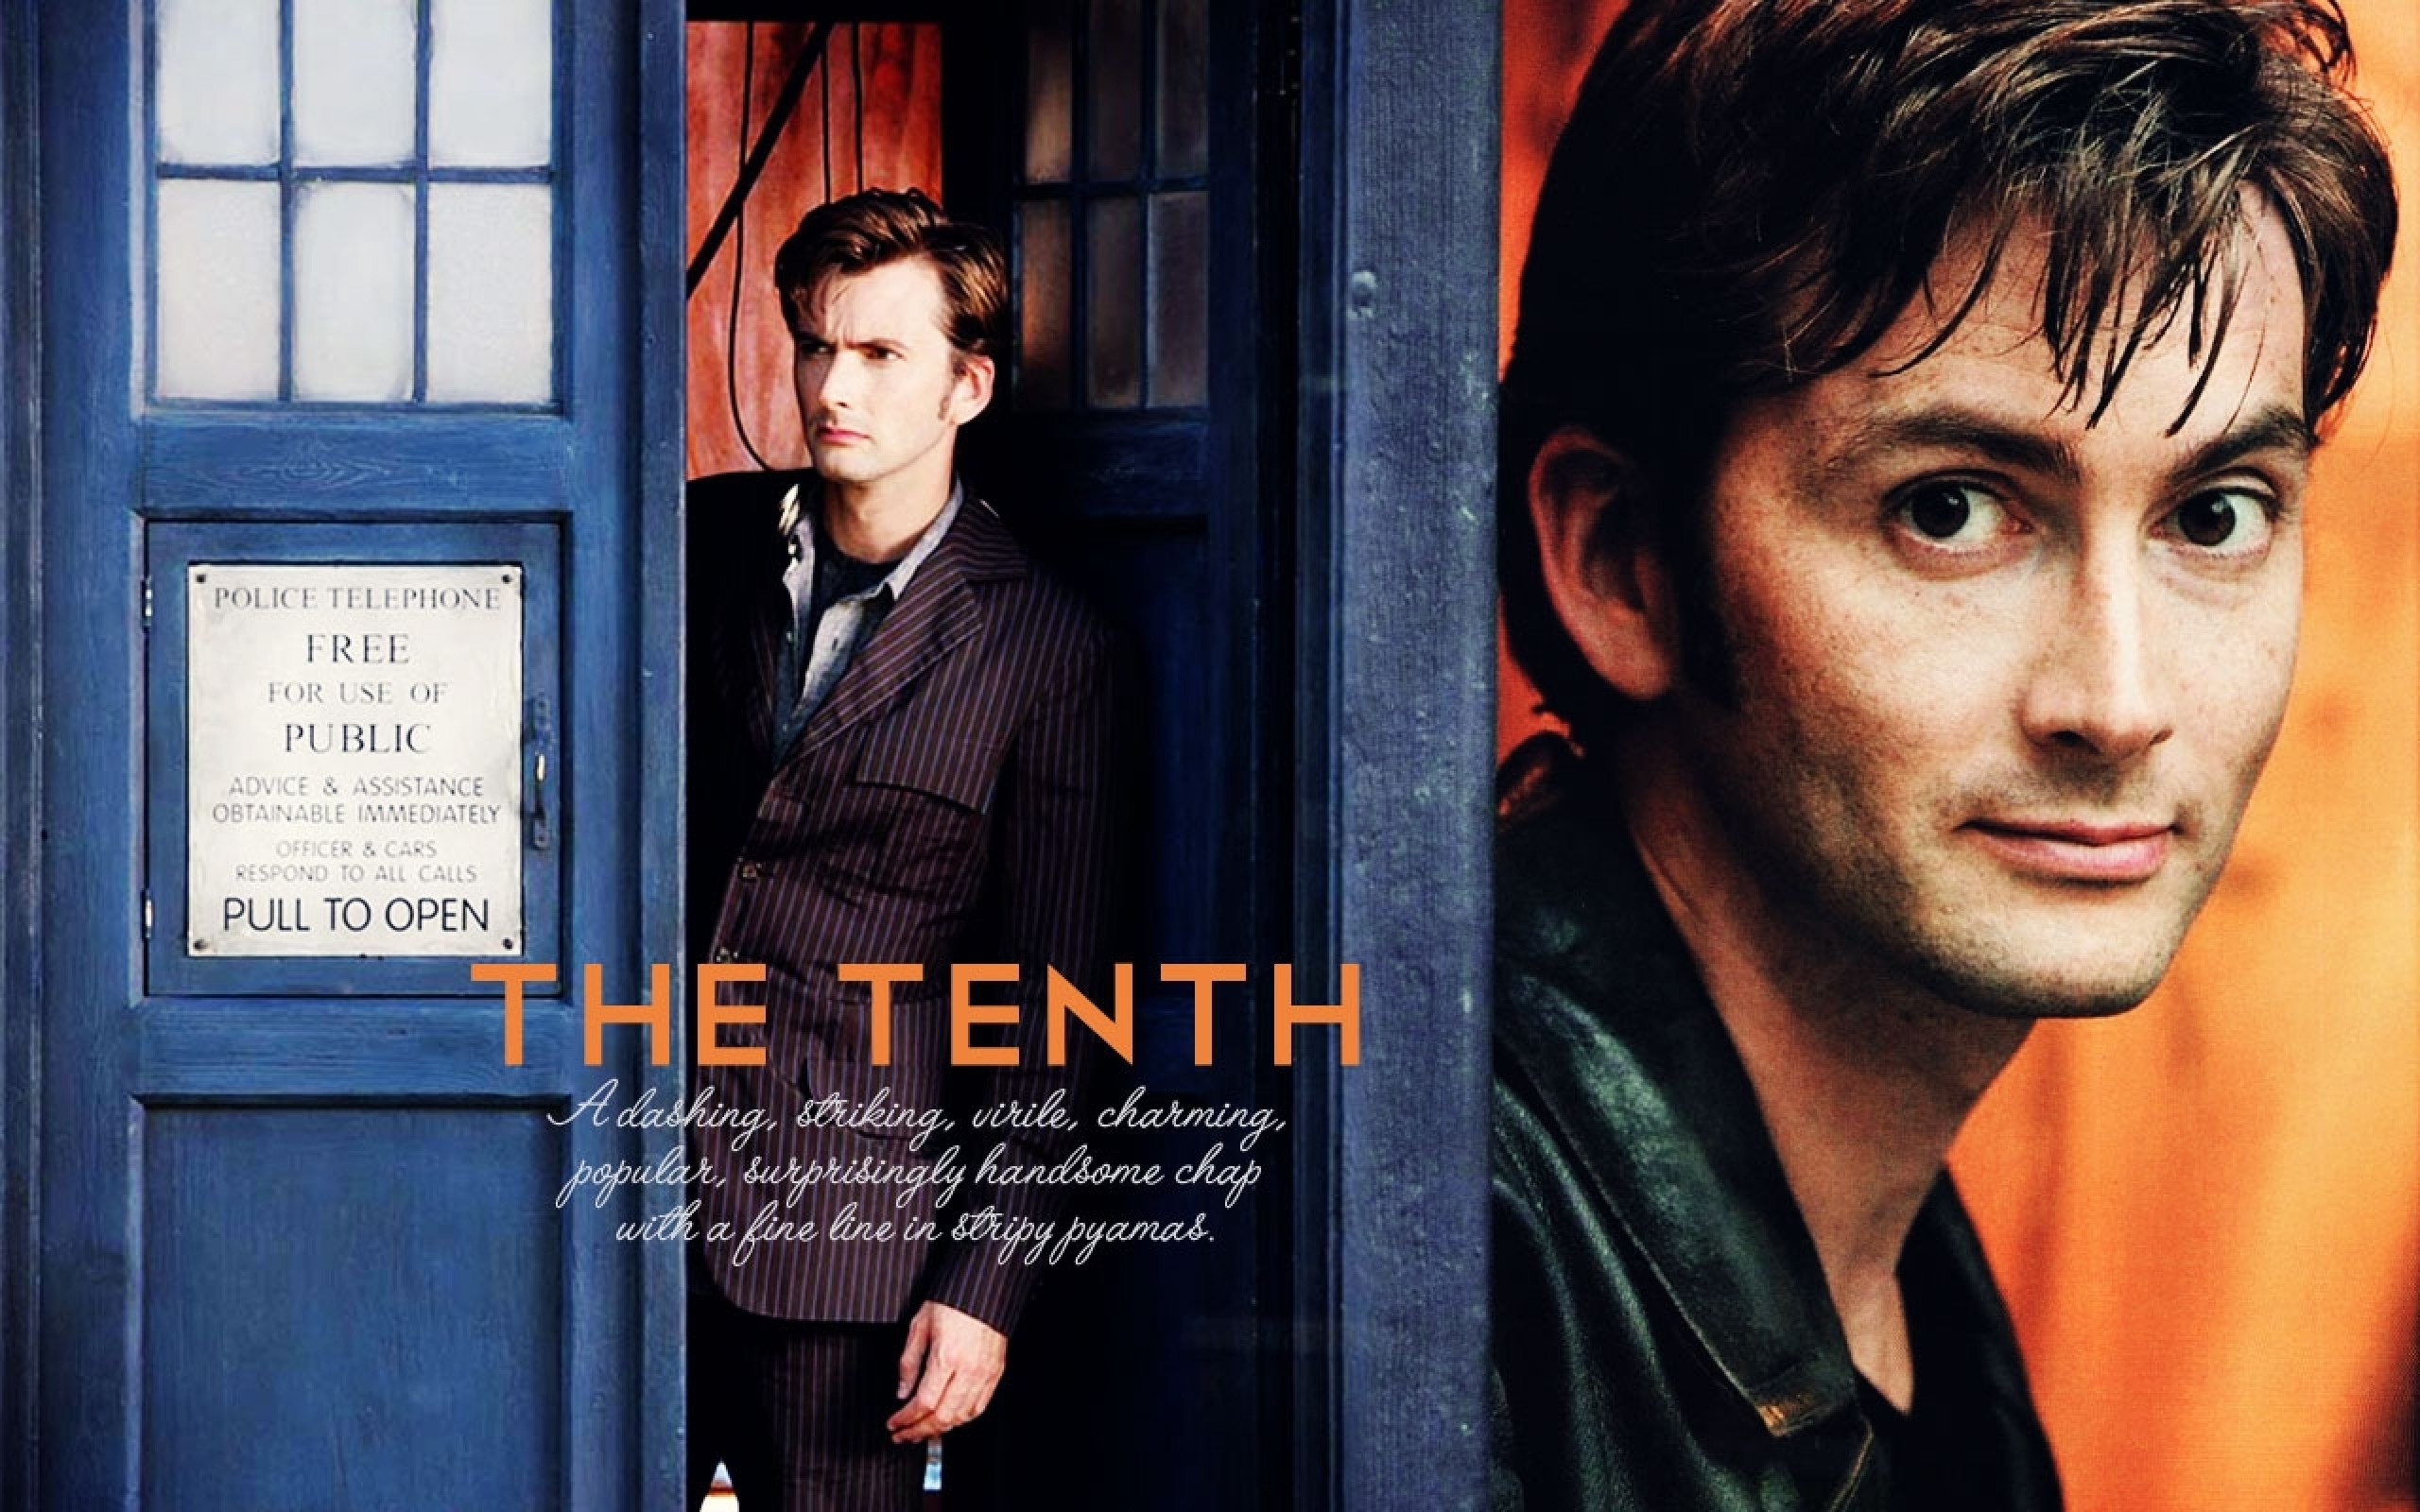 text tardis david tennant doctor who tenth doctor 1280×800 wallpaper Art HD  Wallpaper